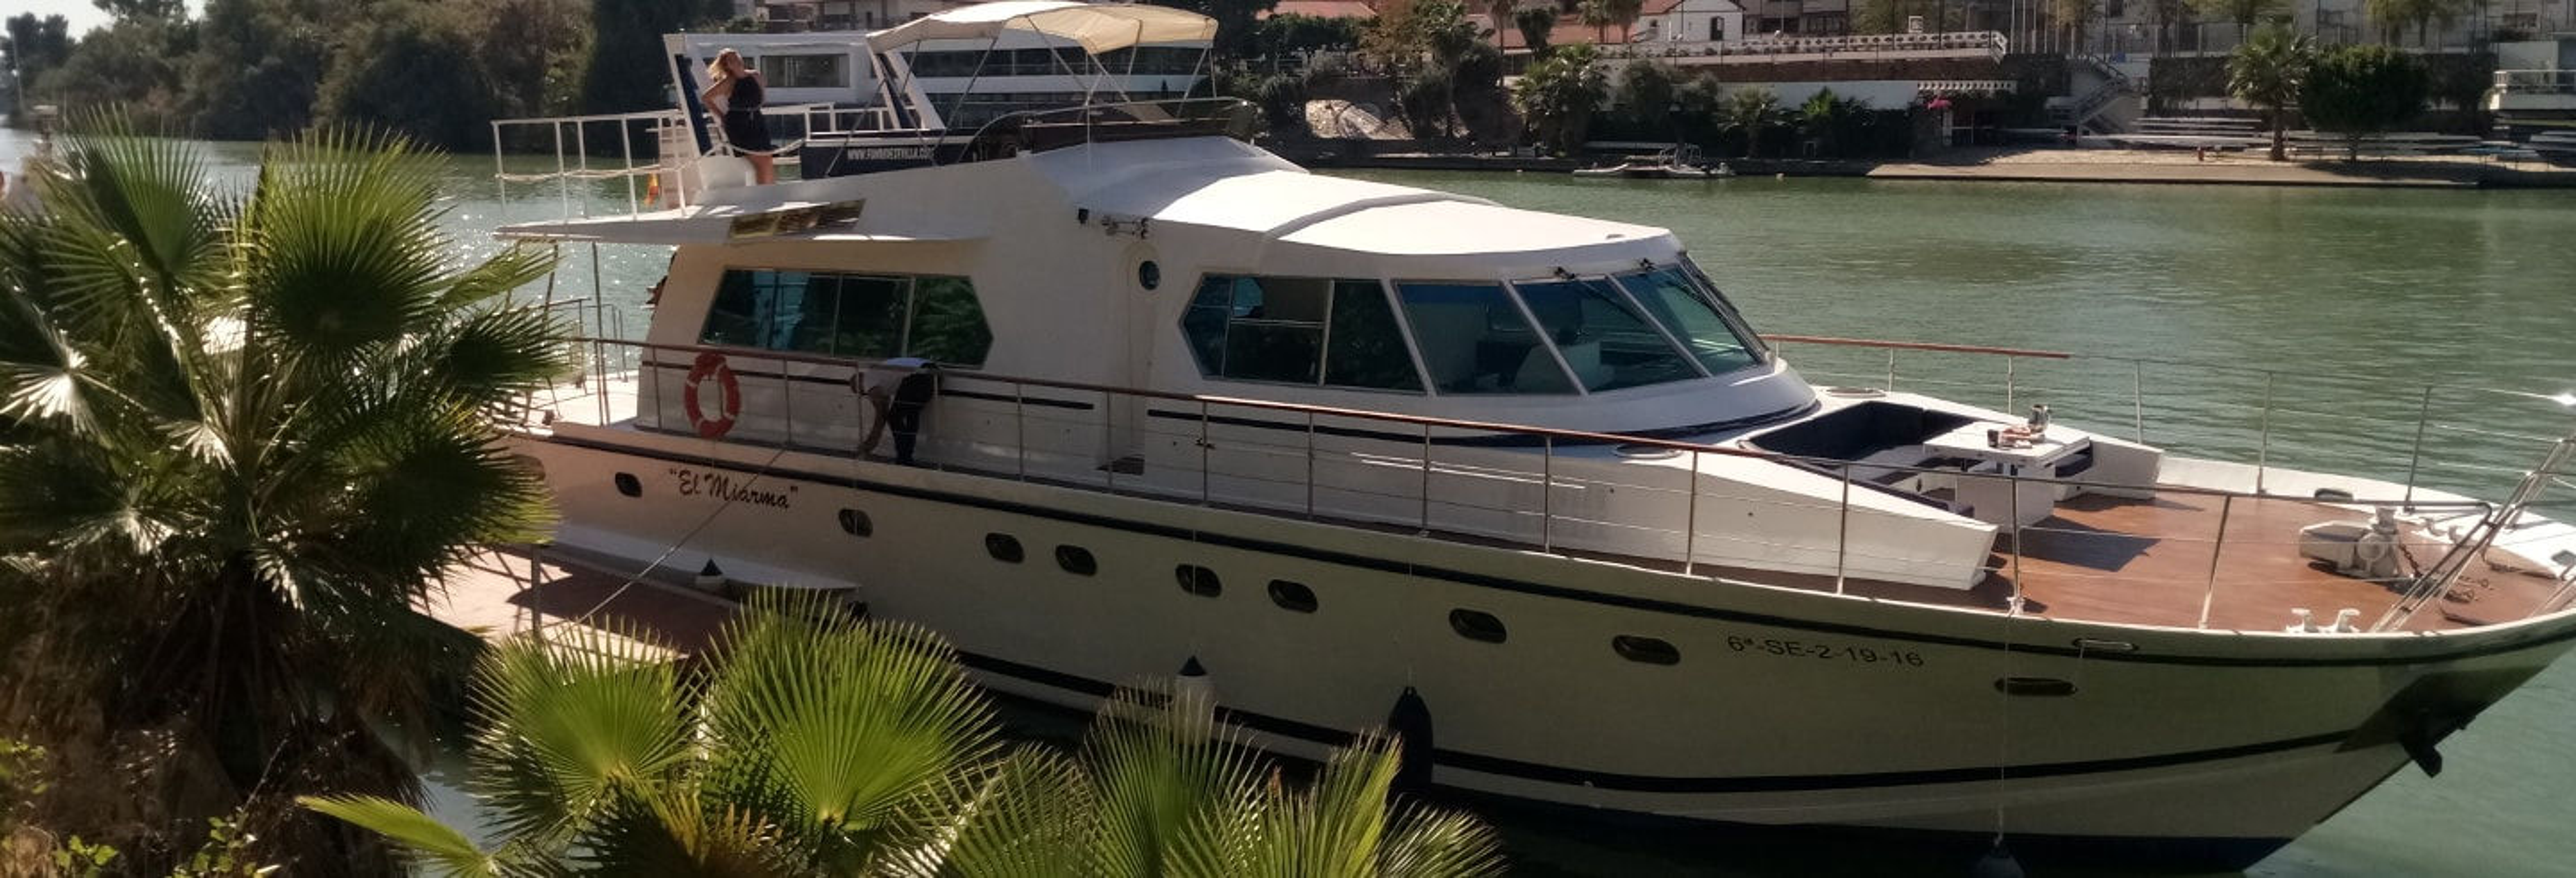 Giro in yacht sul Guadalquivir